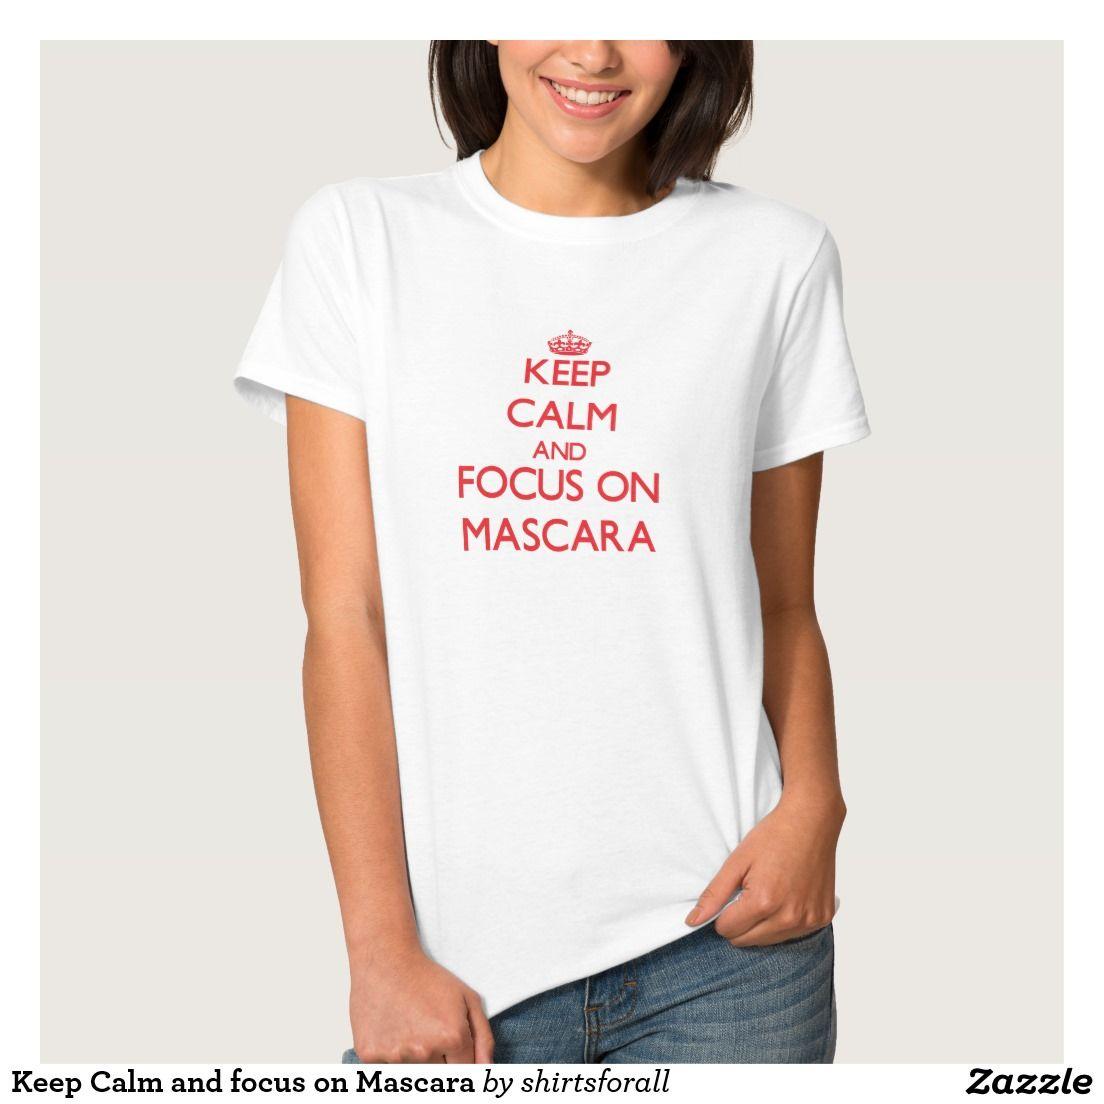 Keep Calm and focus on Mascara T-shirt